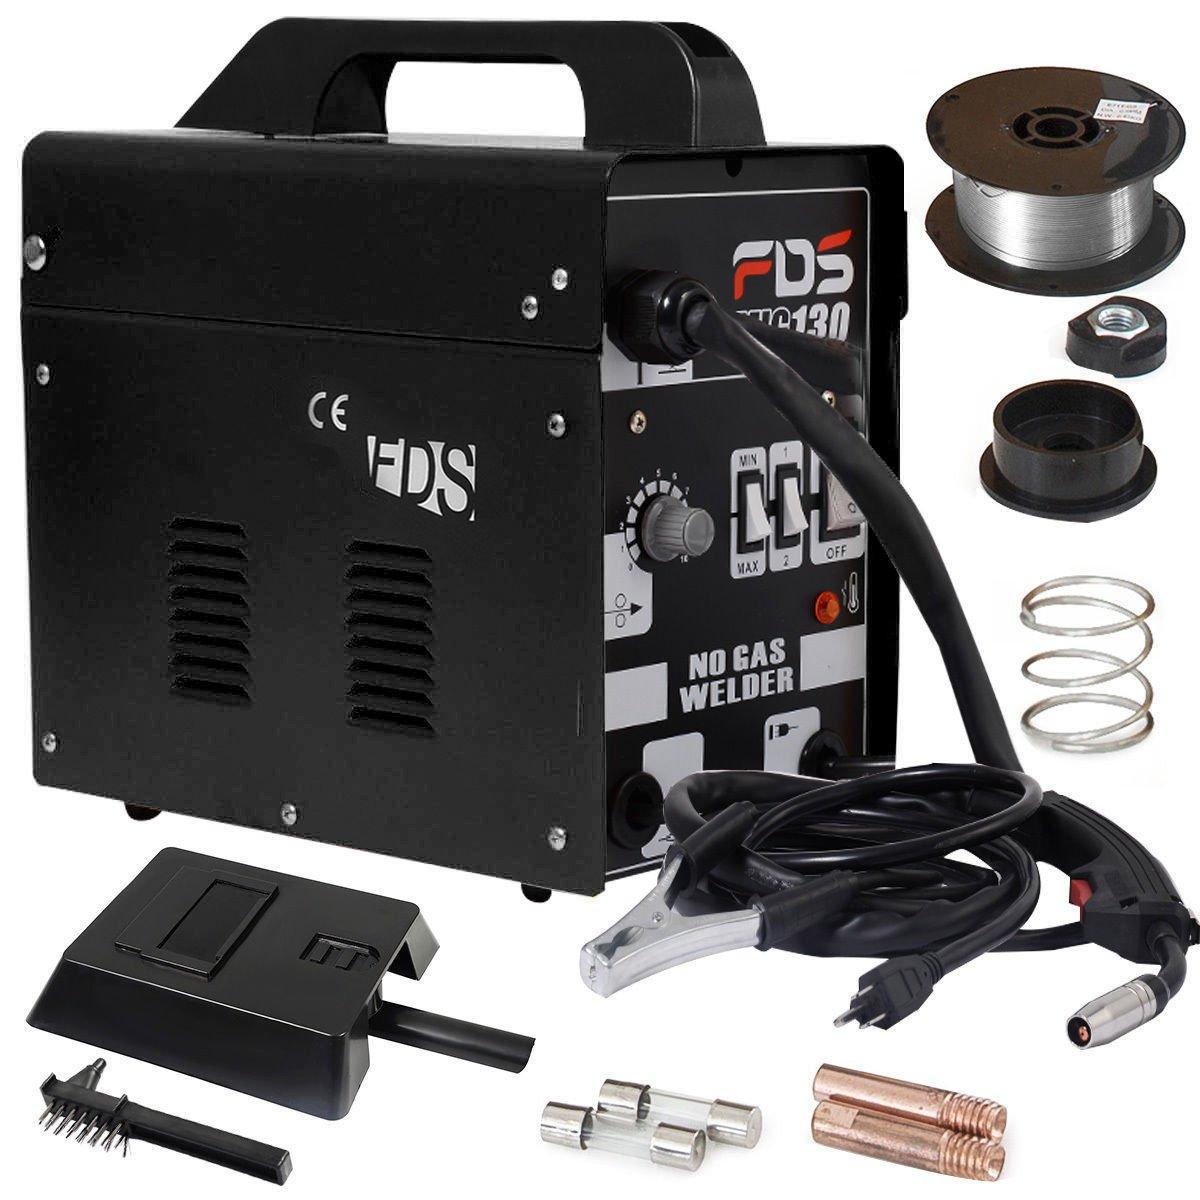 Goplus MIG 130 Welder AC Flux Core Wire Automatic Feed Welder Welding Machine w/ Free Mask Commercial (Black) by Goplus